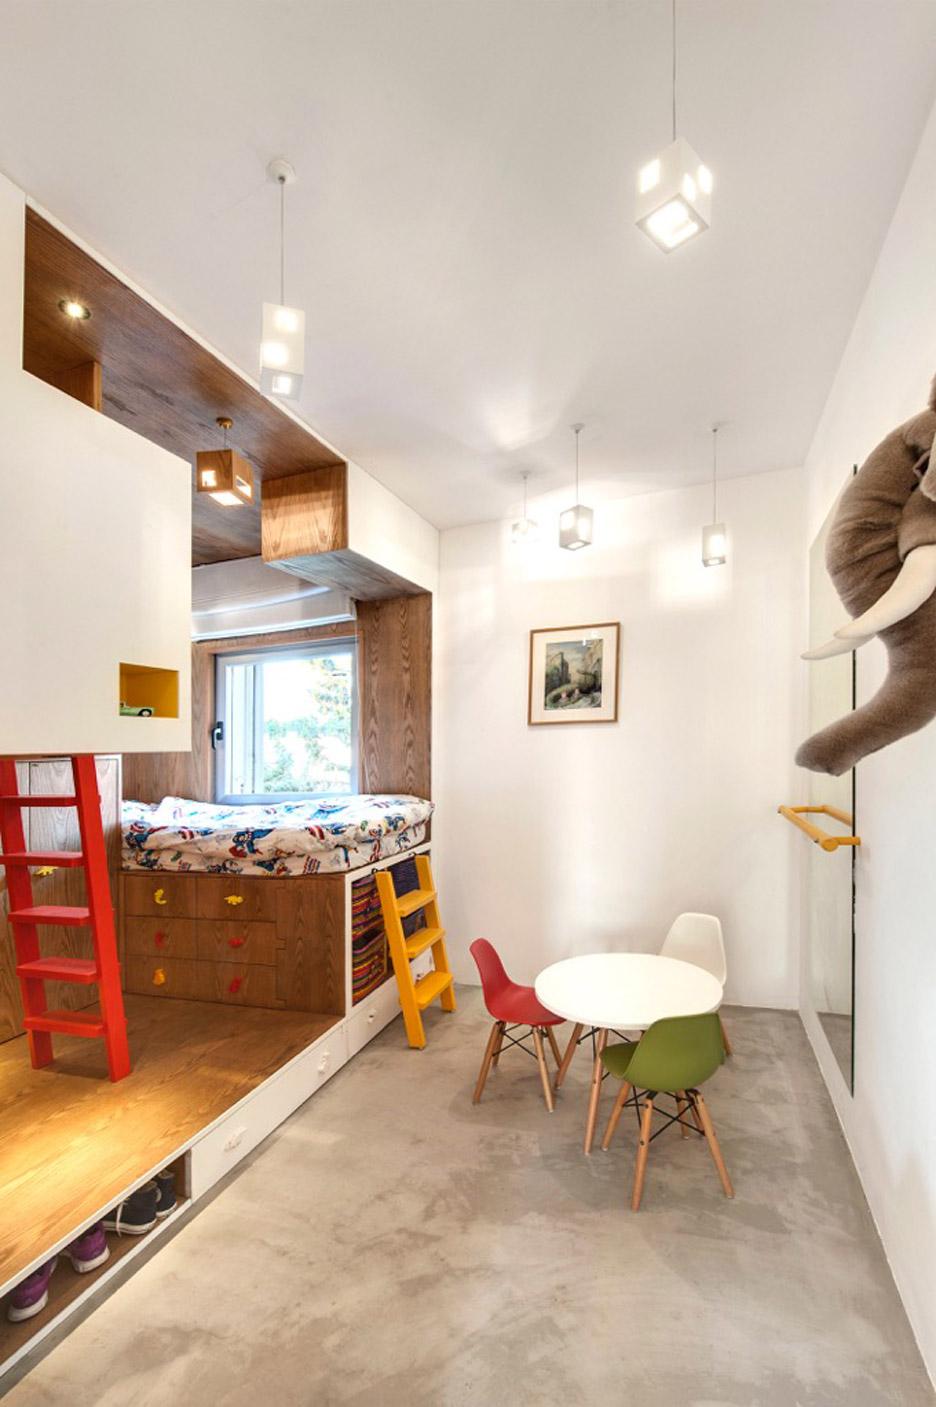 tel-aviv-house-gabrielle-toledano-interior-design_dezeen_936_6